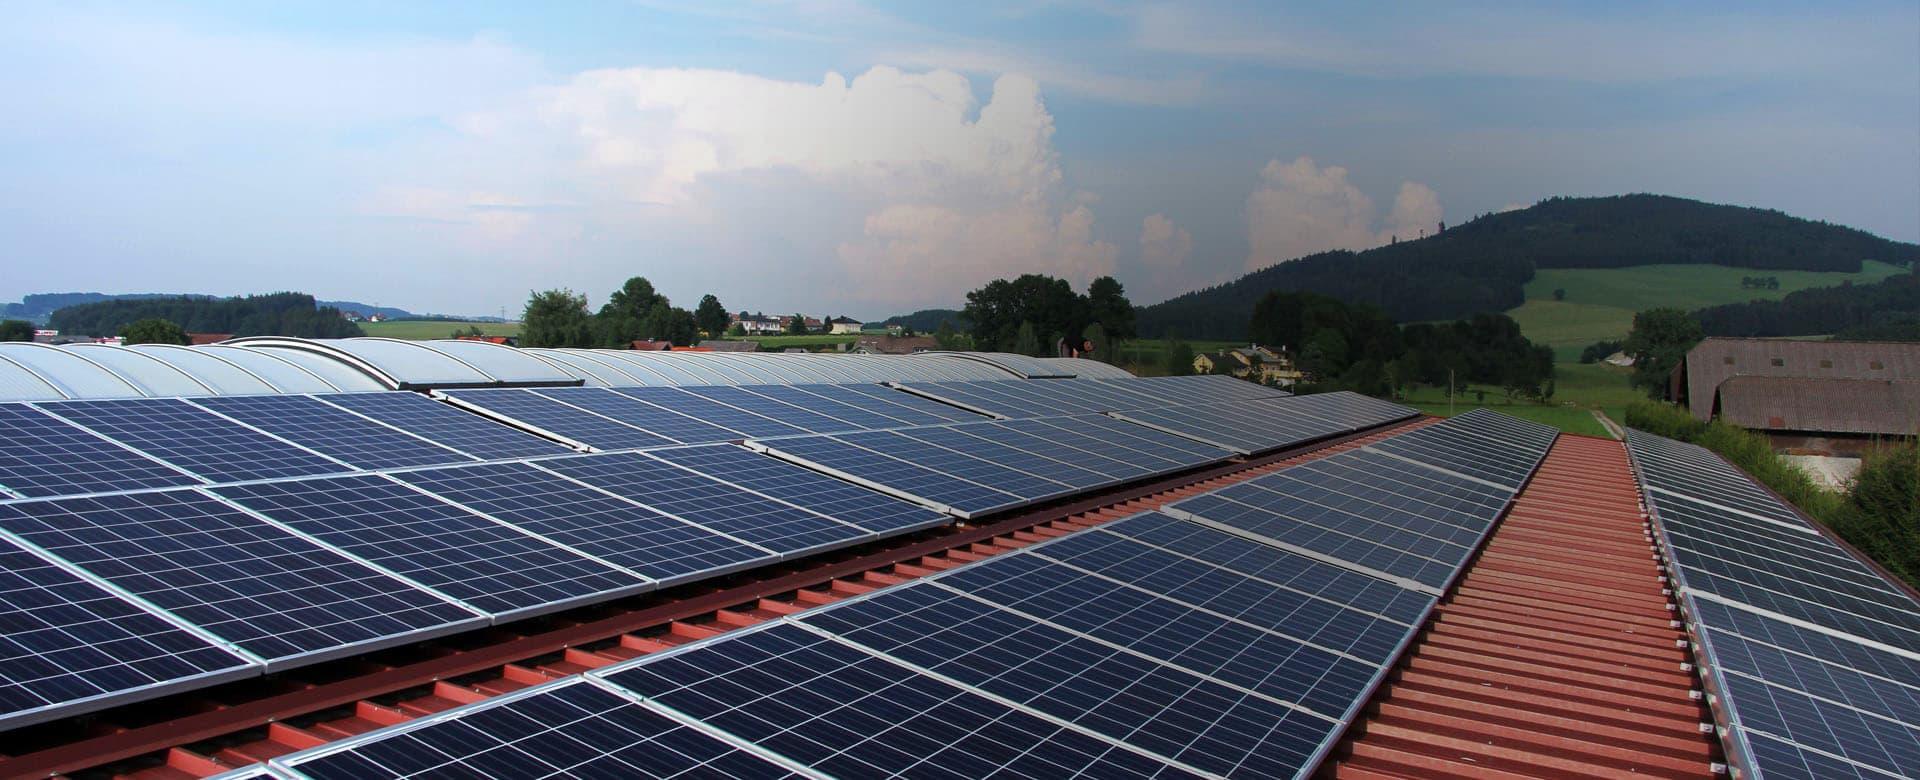 INNOVATIVE SOLAR POWER SYSTEMS